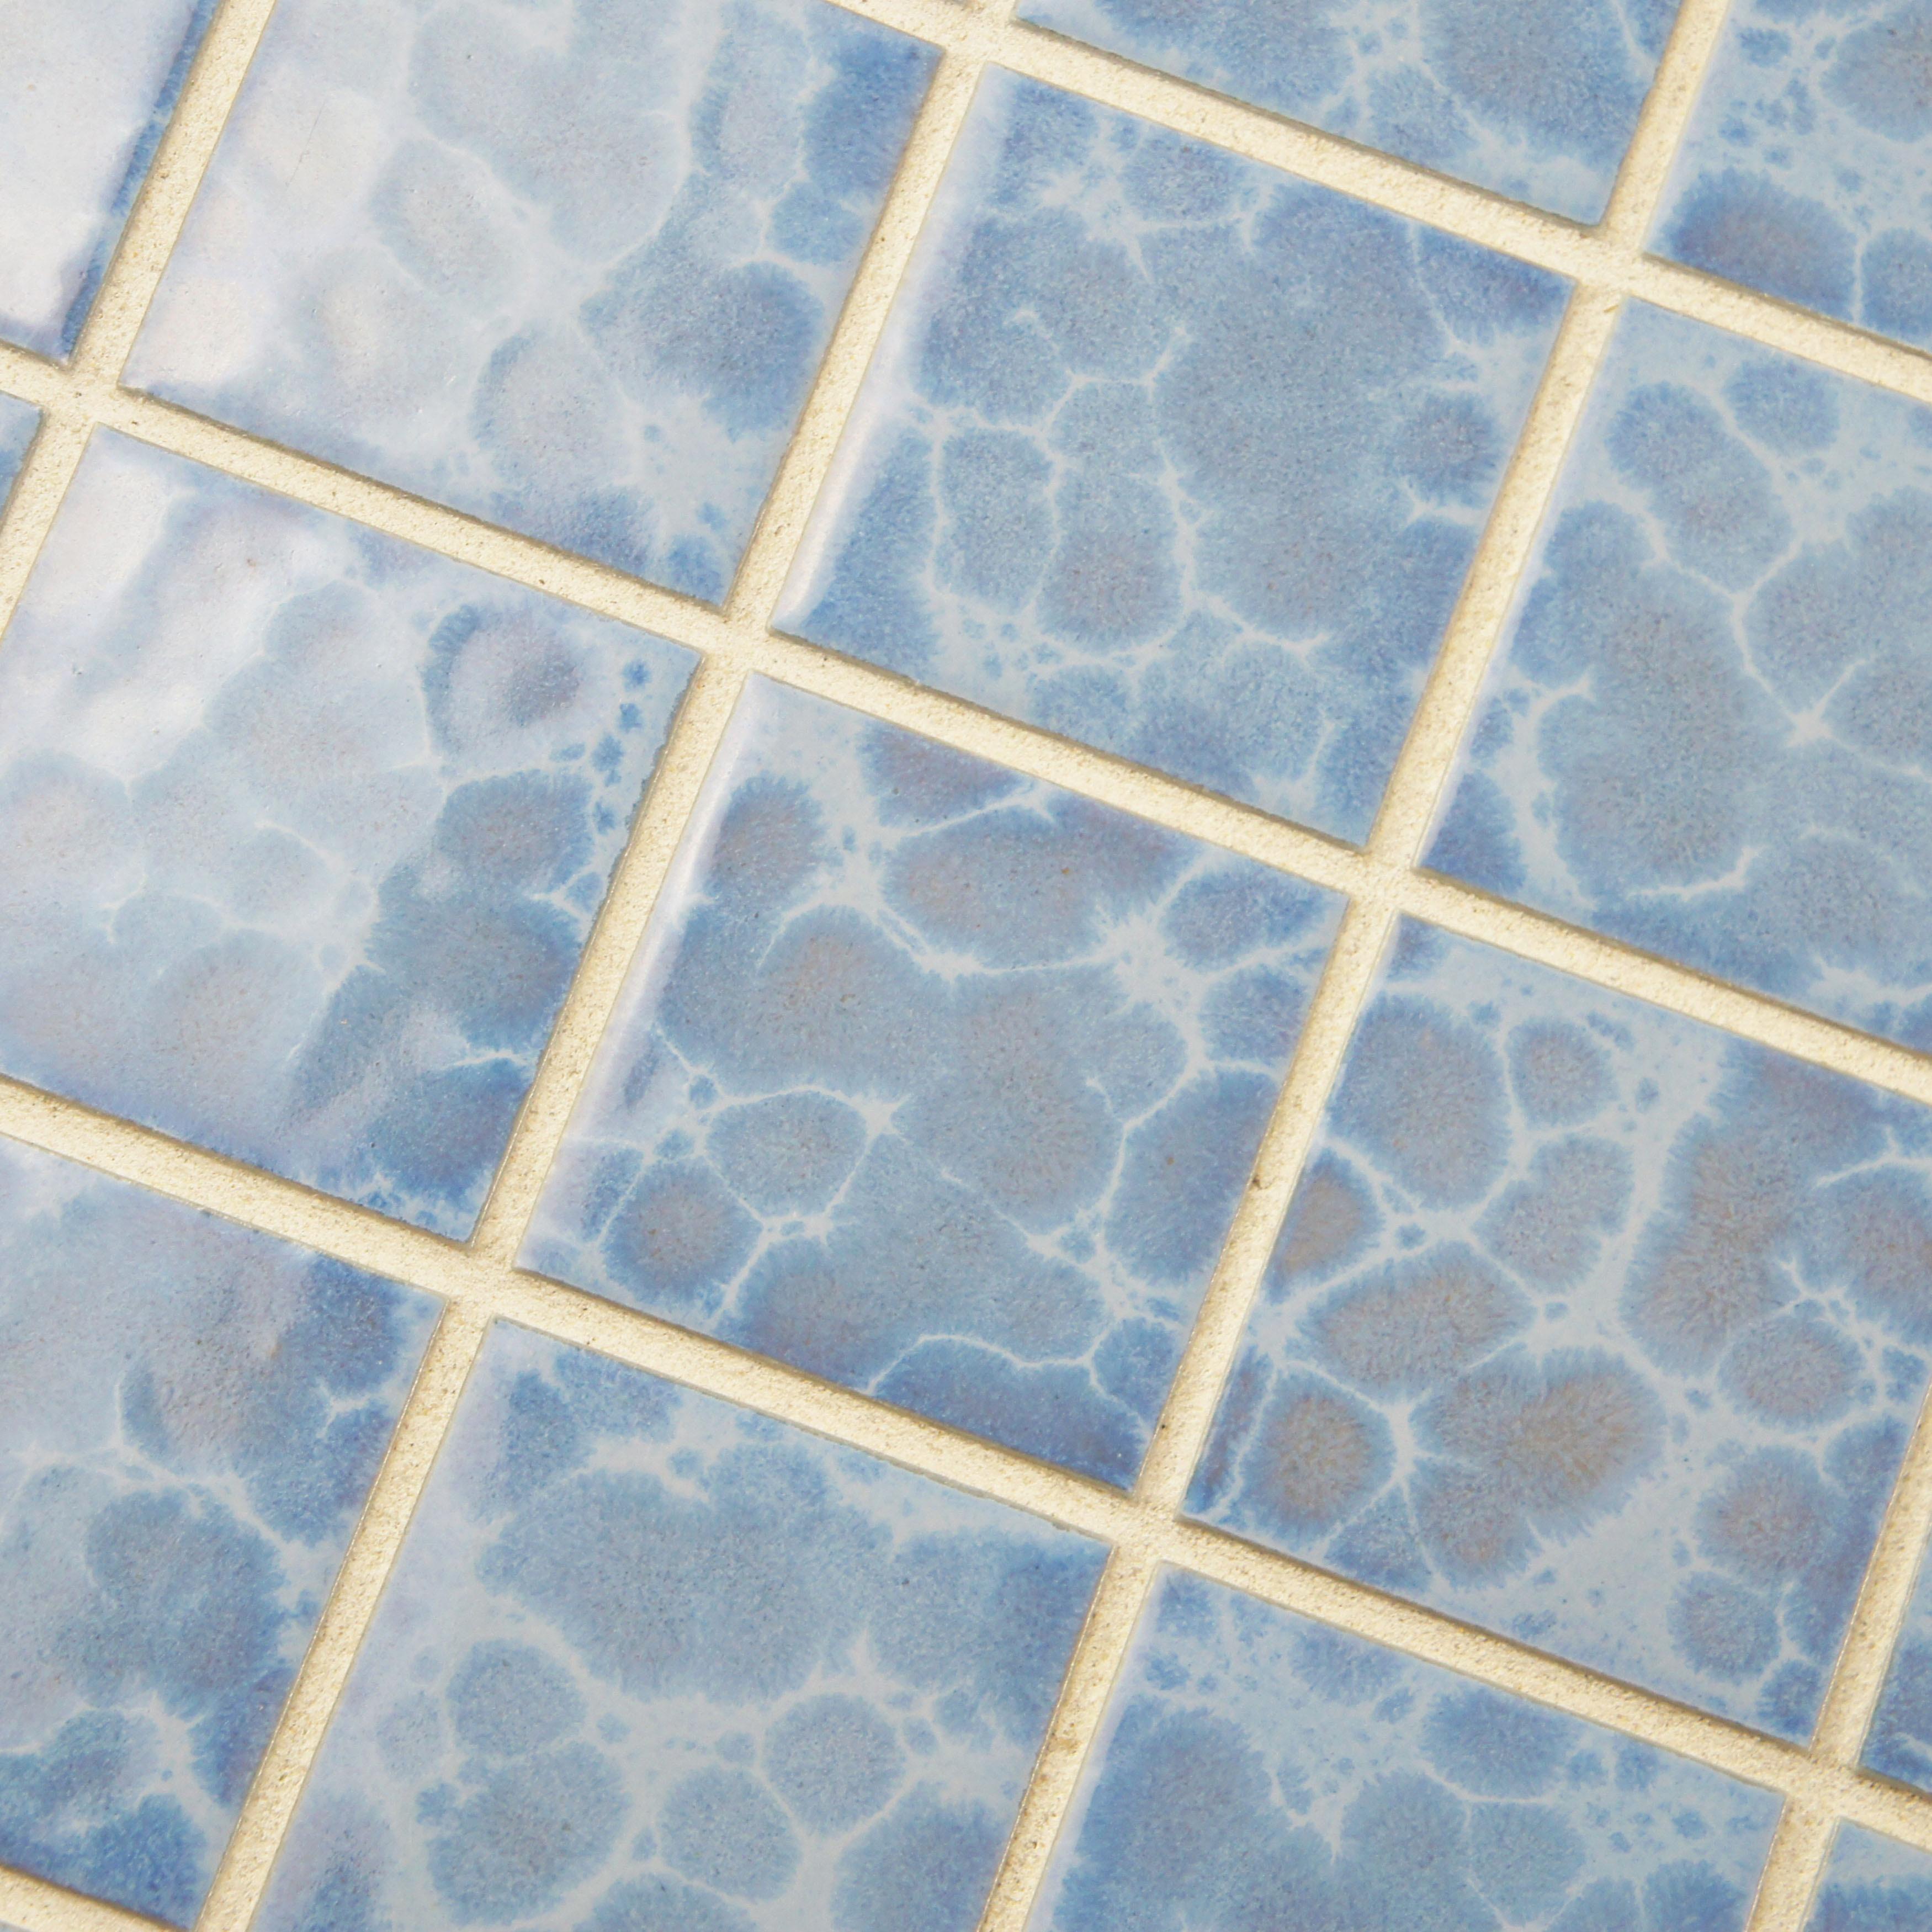 Shop SomerTile 11.875x11.875-inch Watermark Square Alboran Porcelain ...